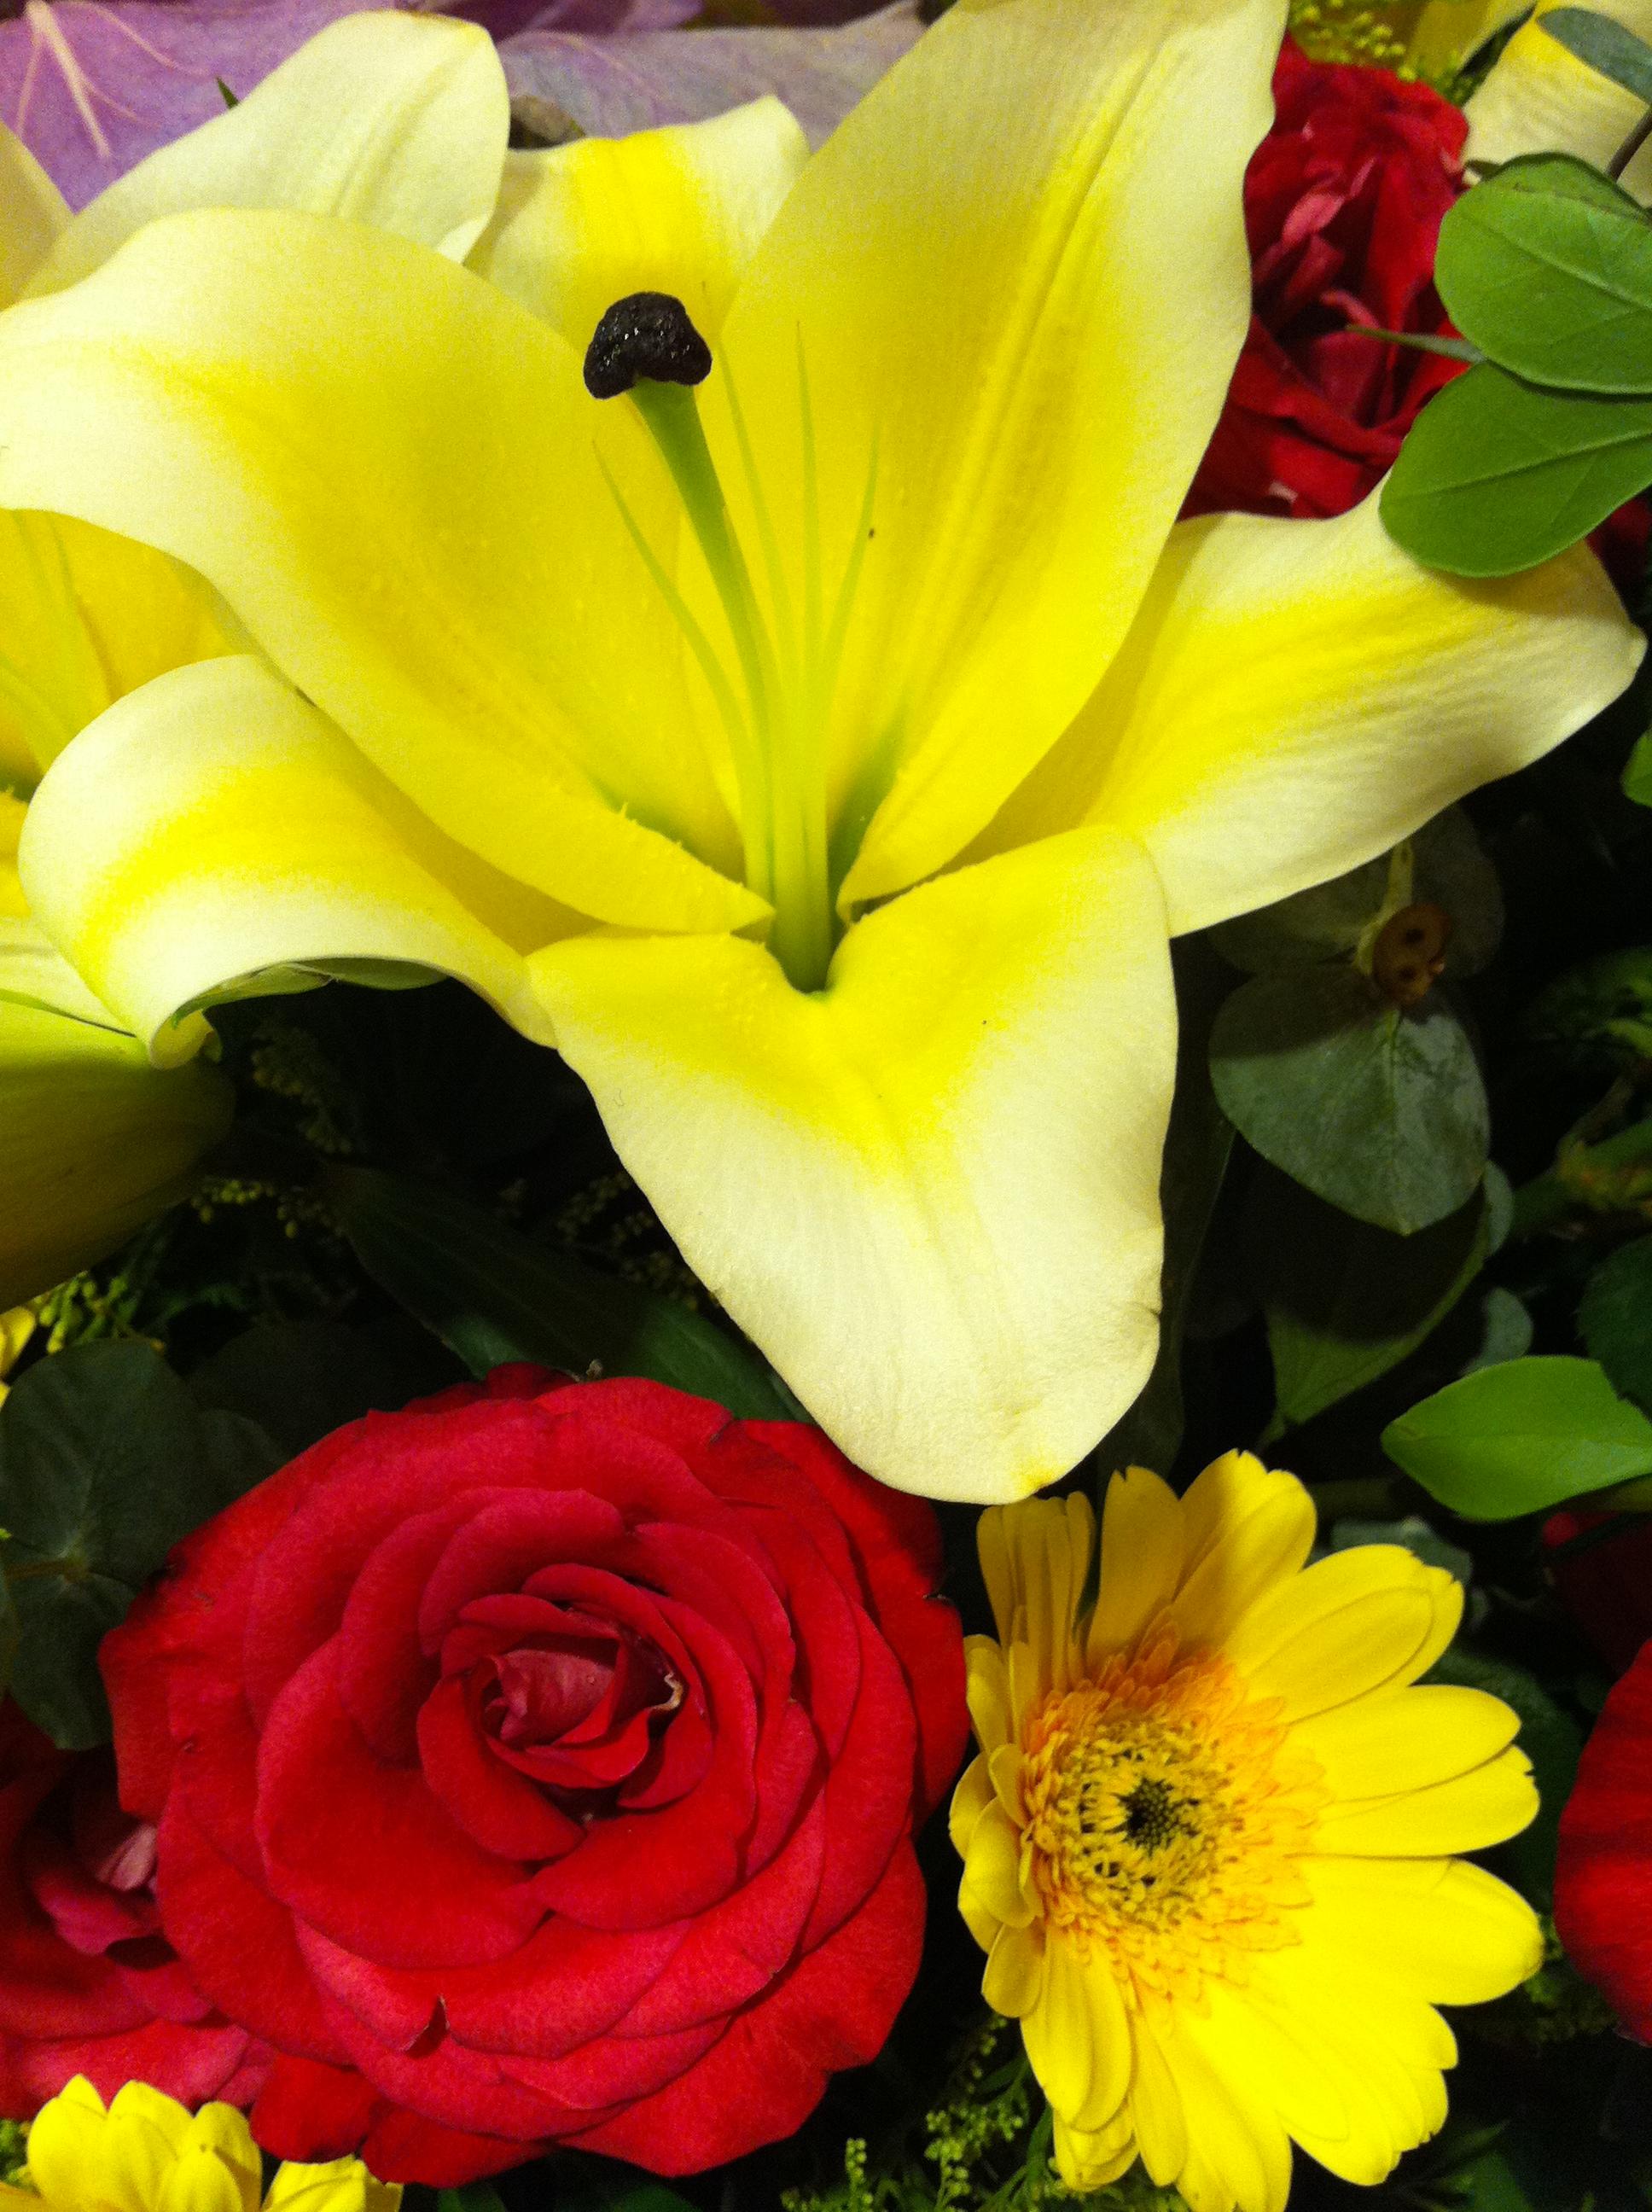 Filehk Sai Wan Ho Flower July 2013 Red Rose Yellow Lily Daisyg